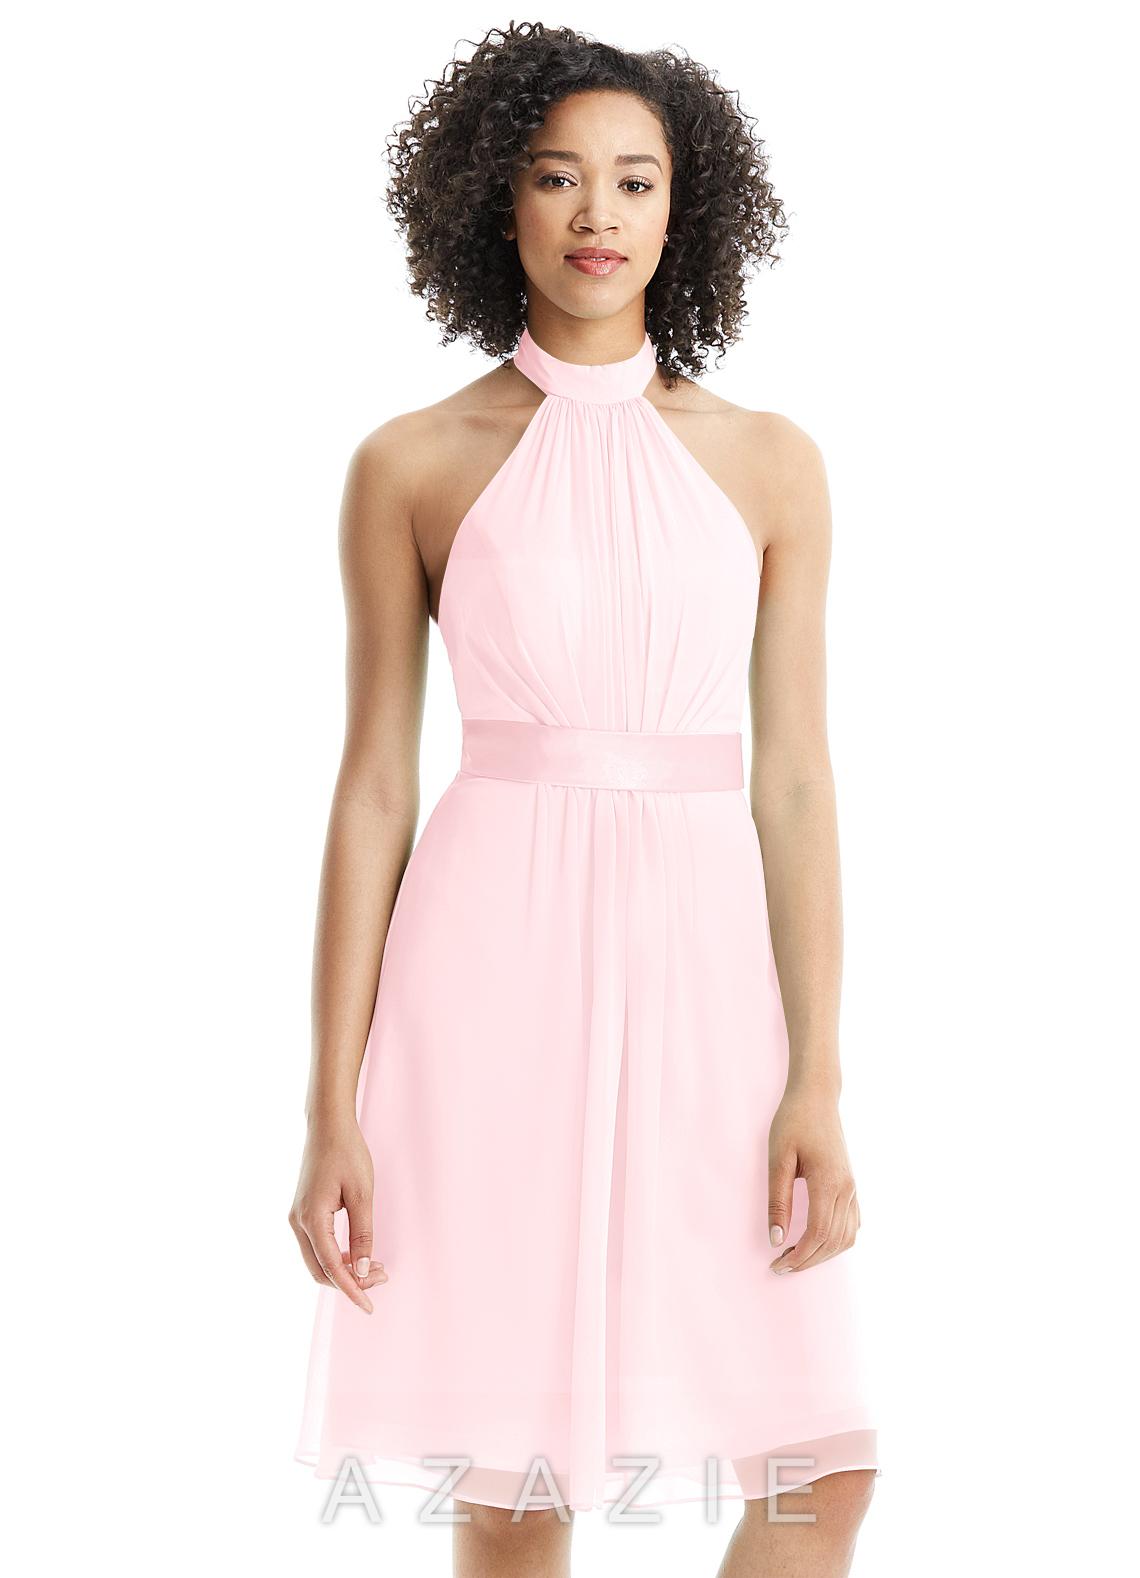 c6bea5ad28c62 Azazie Aiyana Bridesmaid Dress | Azazie